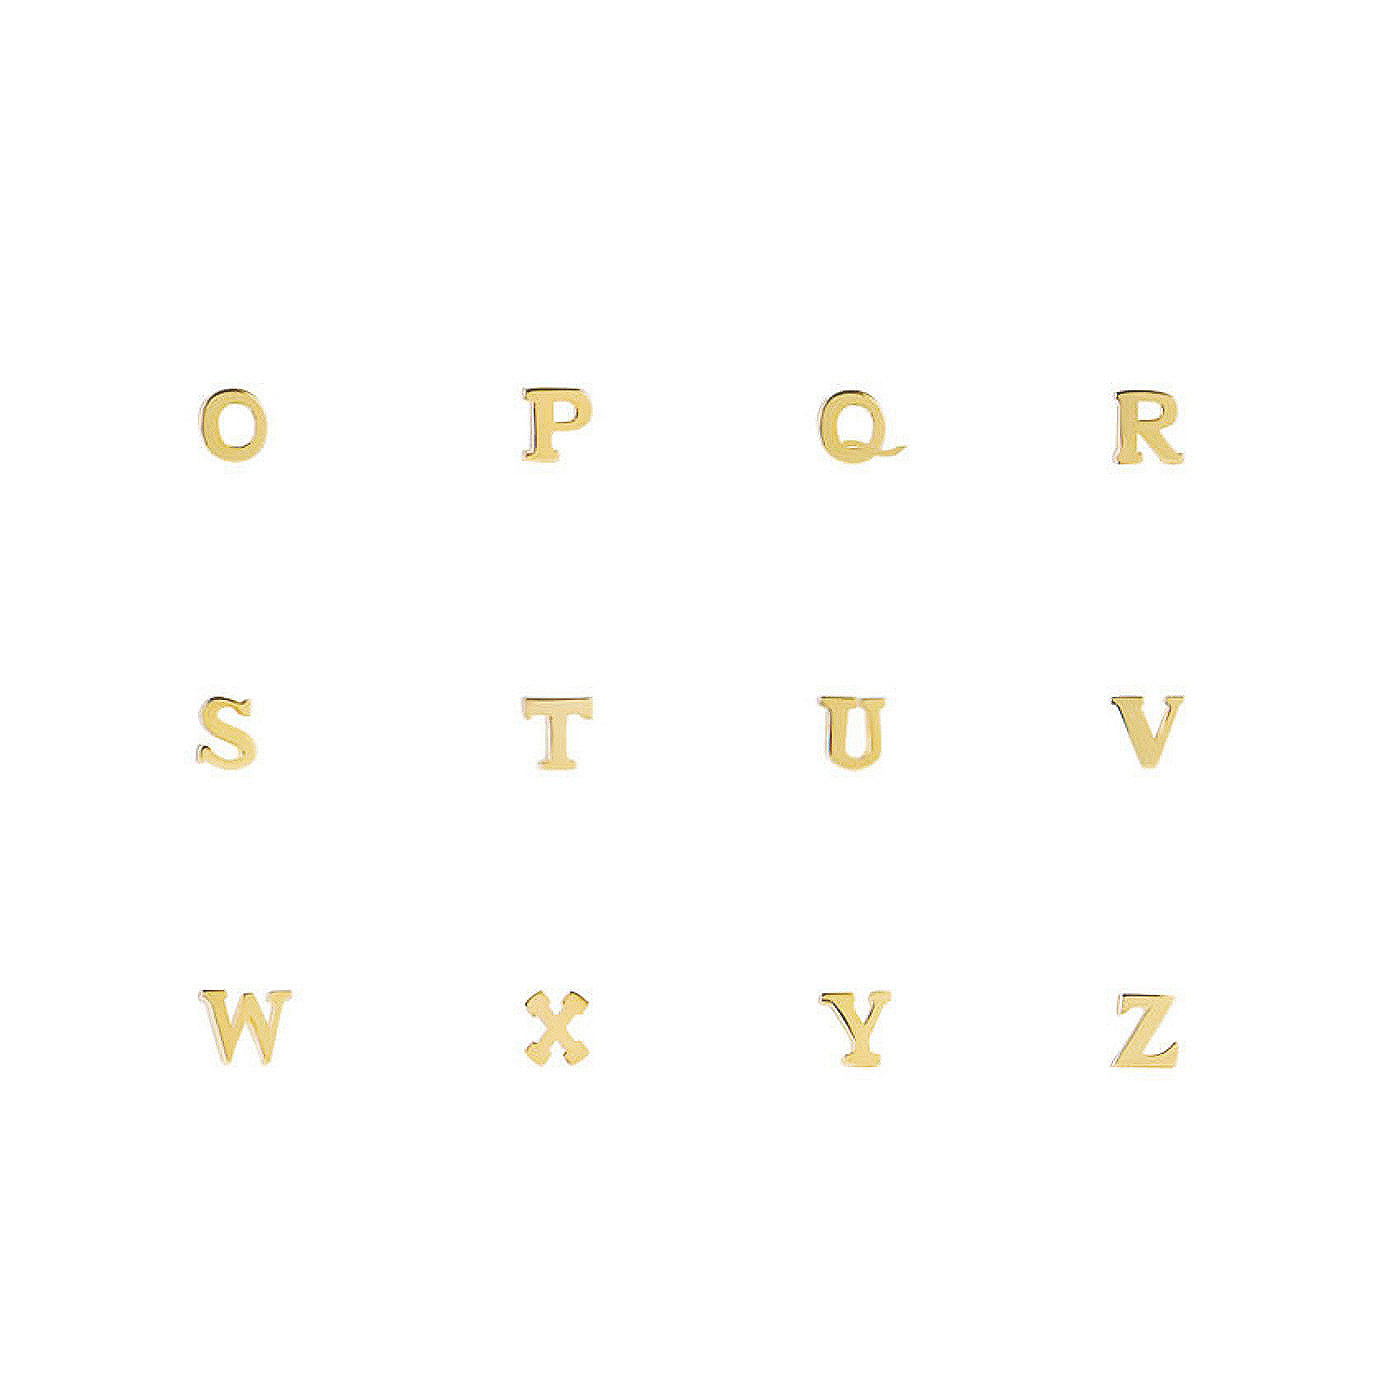 Isabel Bernard Le Marais Guillaine singola orrechini a bottone iniziale in oro 14 carati